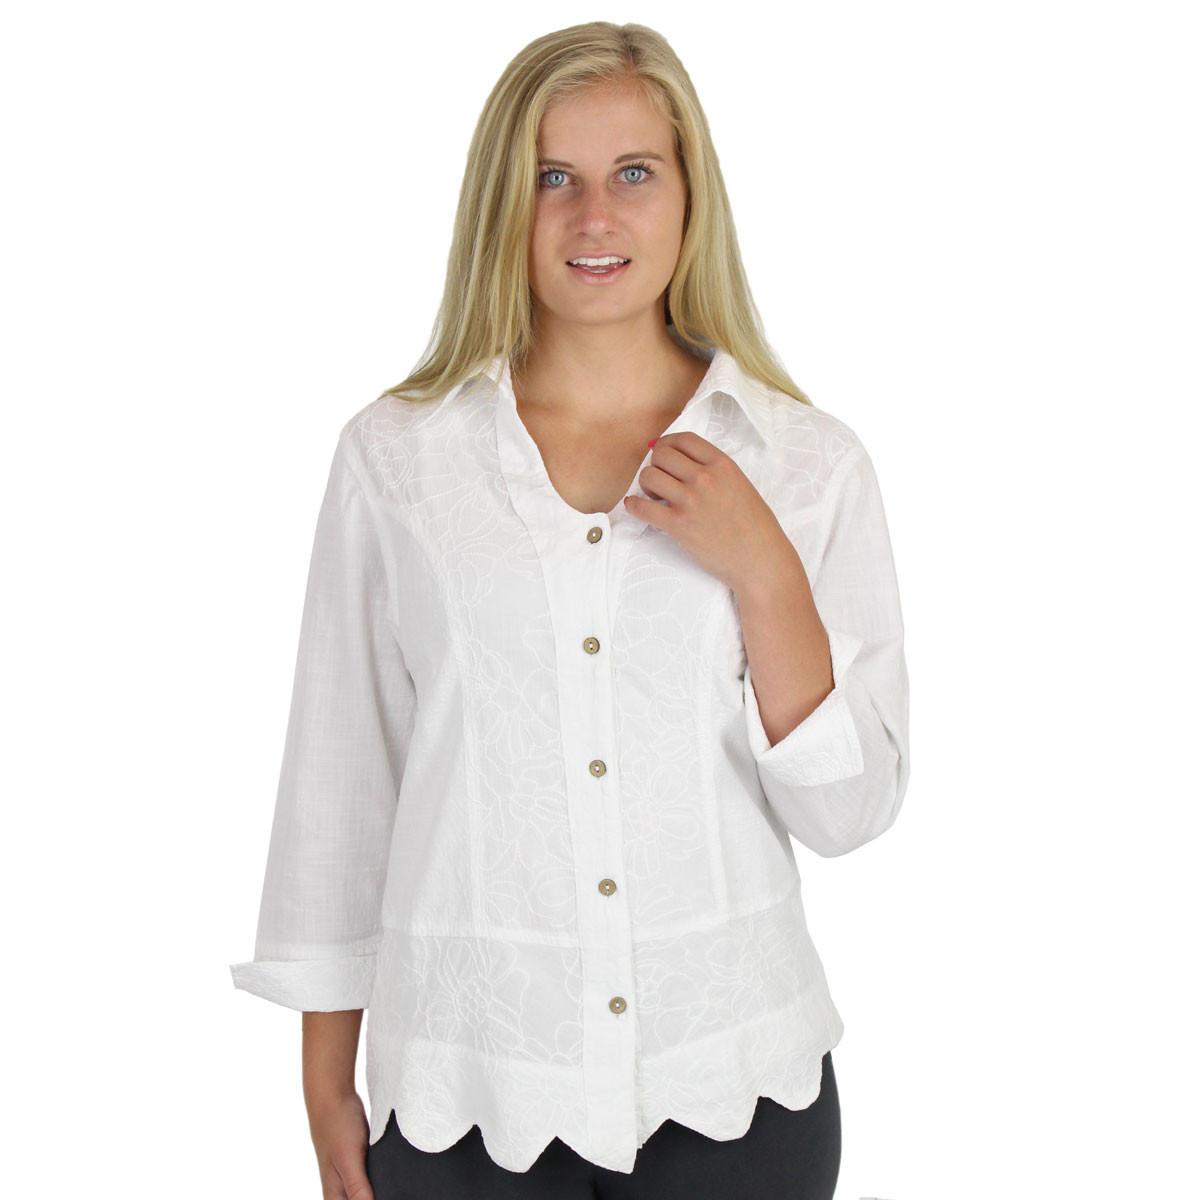 ca09f702d44d48 Embroidered Cotton Shirt Jacket SB-018